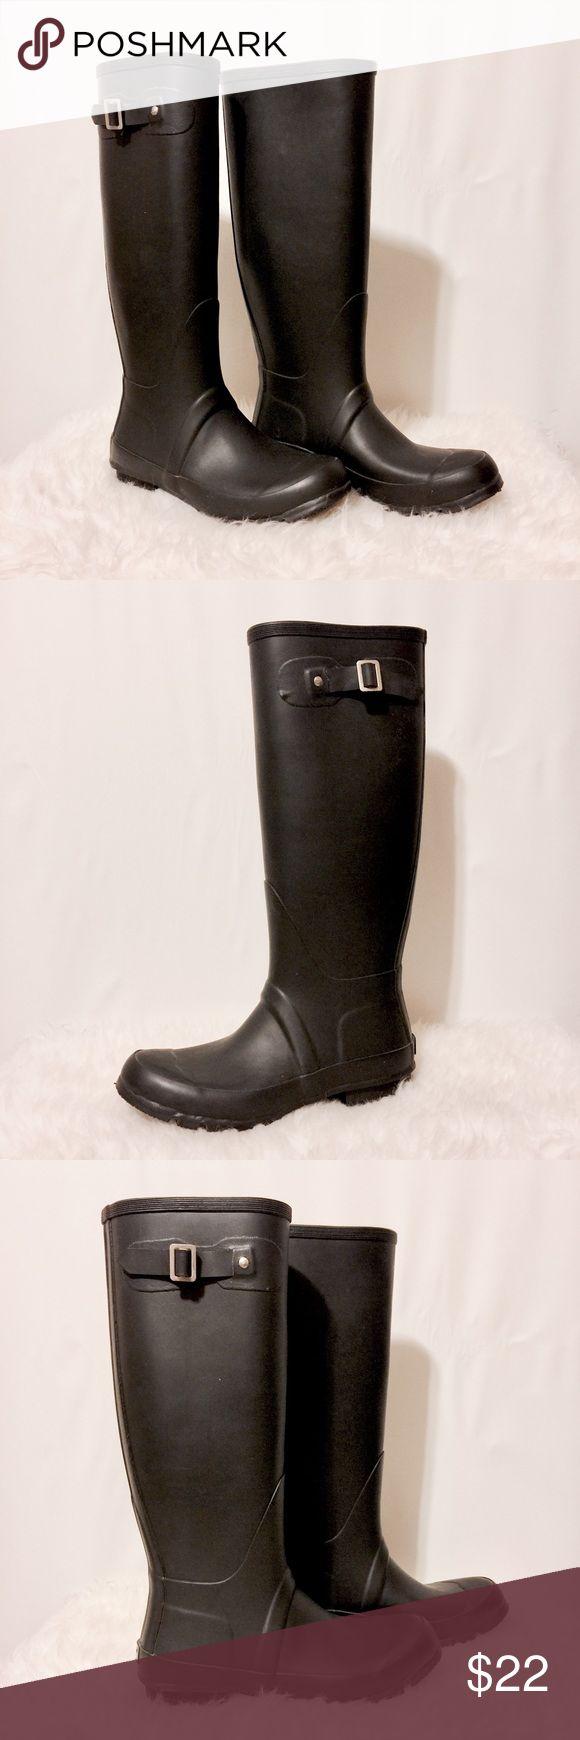 "✨ Black Rain Boots NWOB Brand new rain boots! 17"" tall 1"" heels 15"" calf UNIONBAY Shoes Winter & Rain Boots"